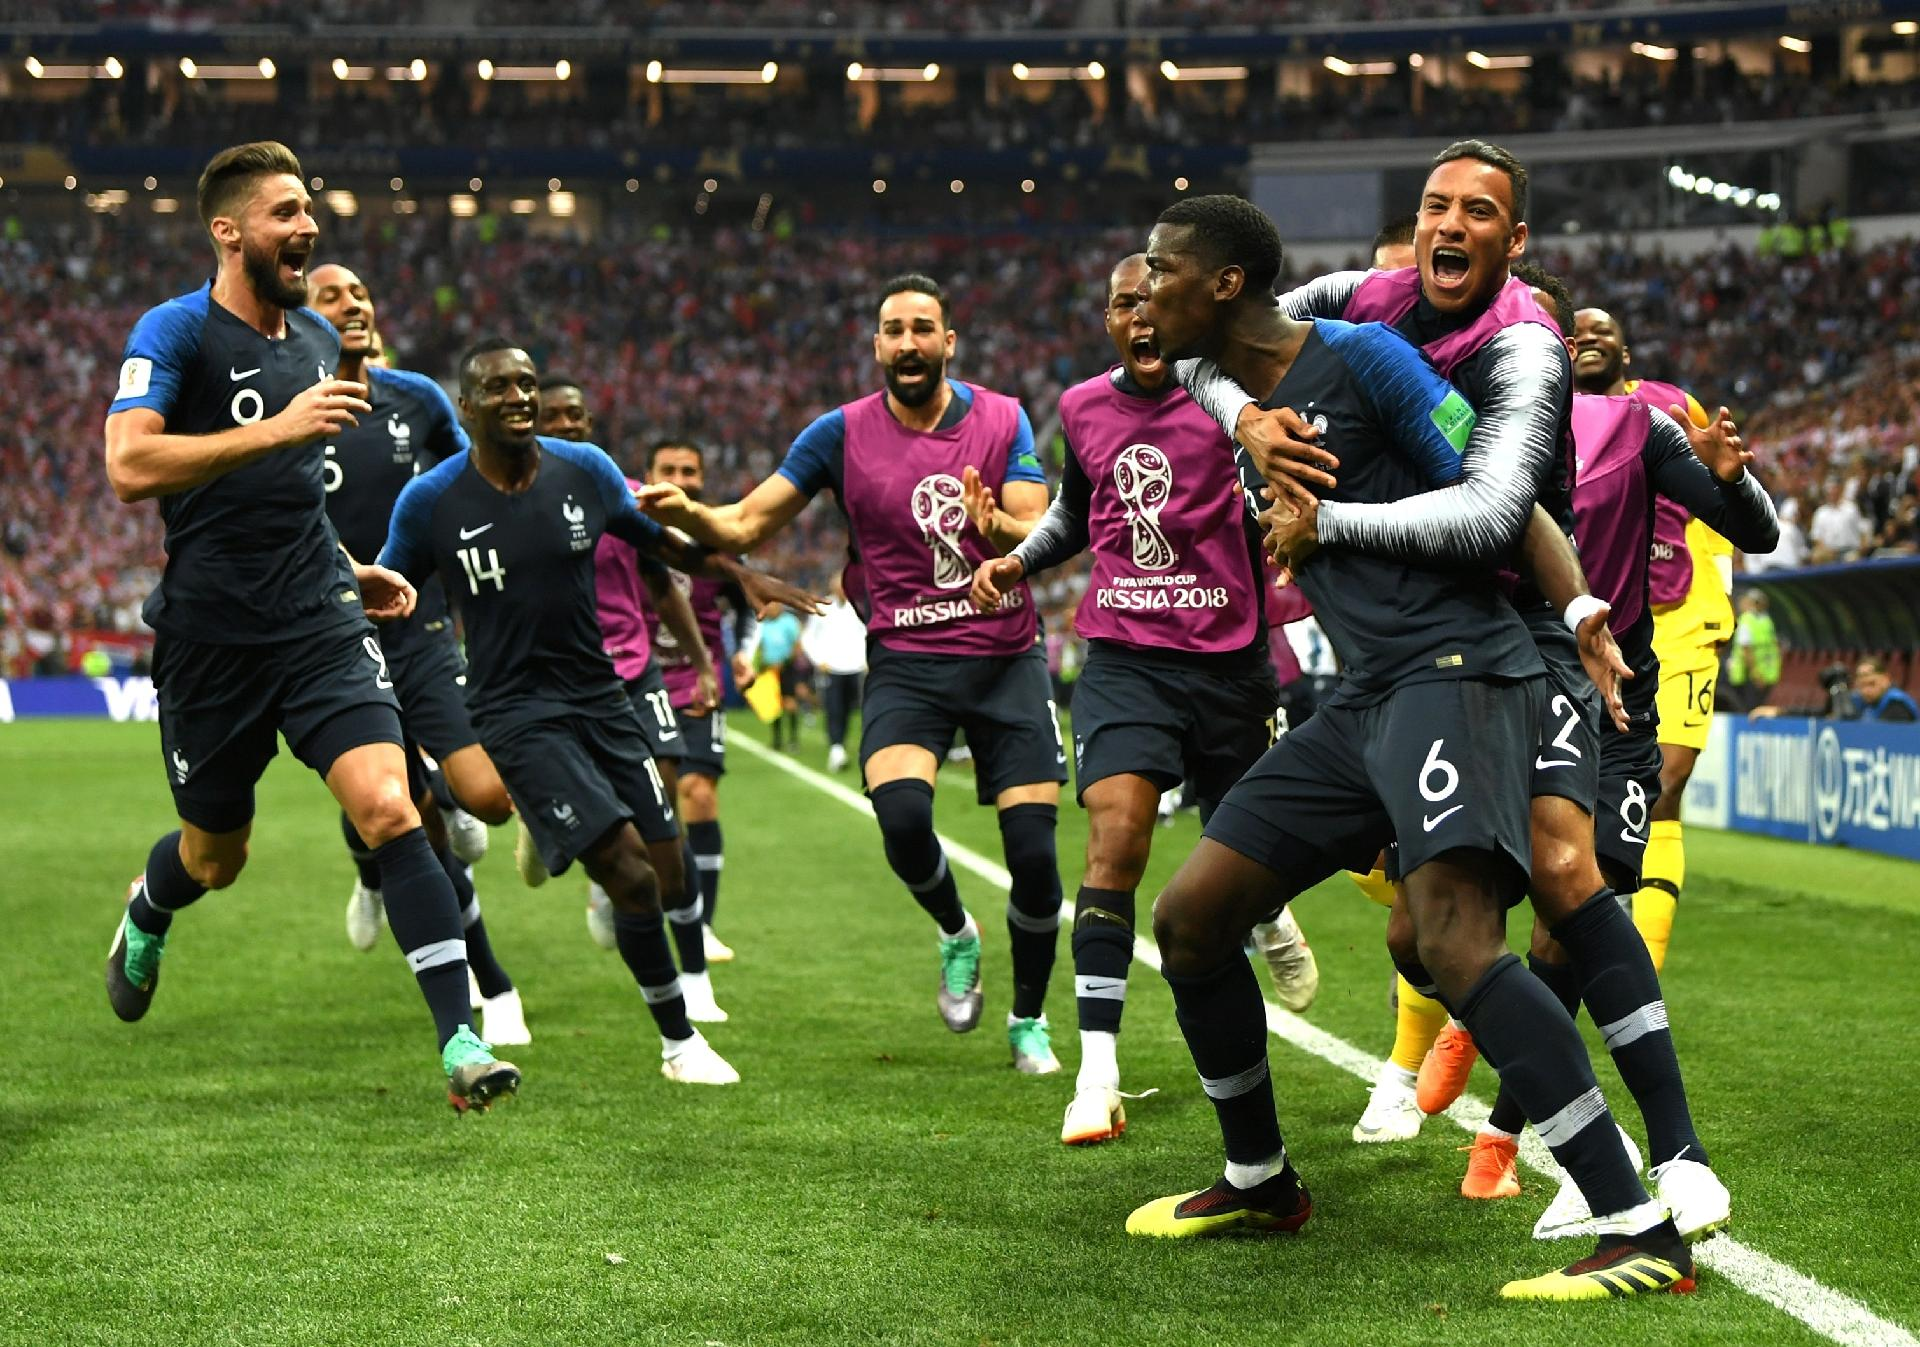 França na Copa 2018